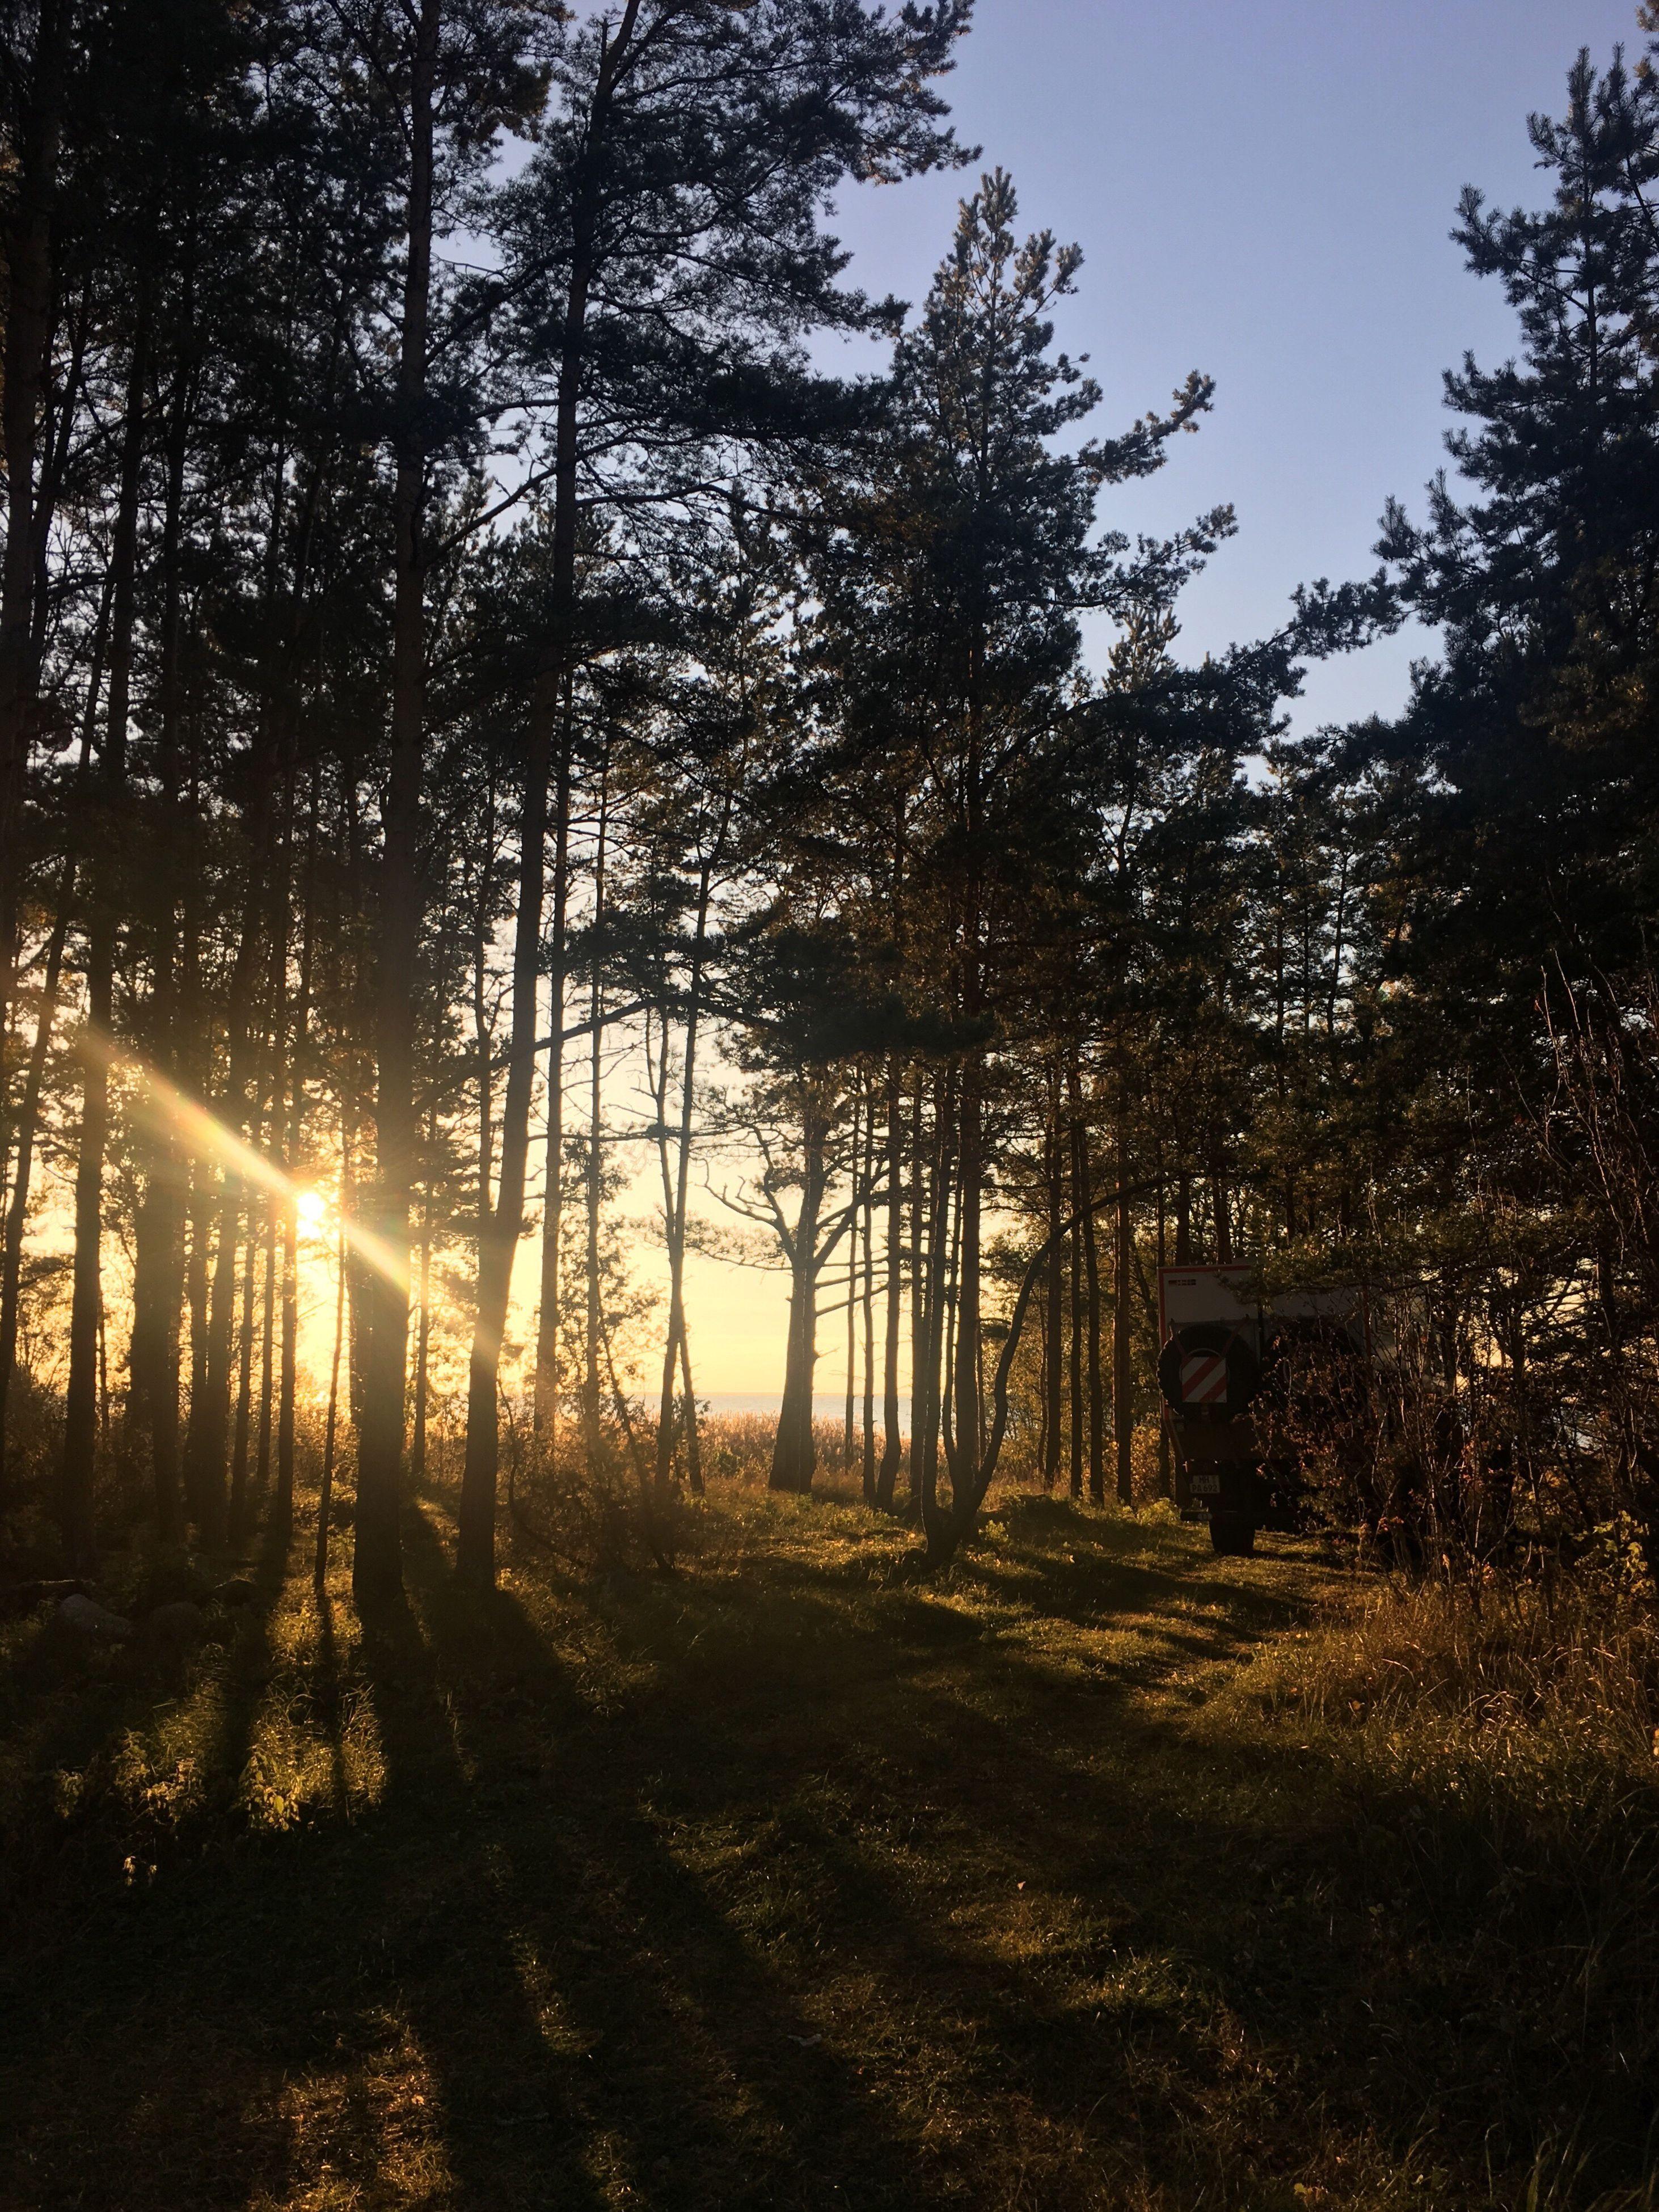 tree, nature, sky, sunlight, growth, sunset, beauty in nature, no people, outdoors, sunbeam, sun, day